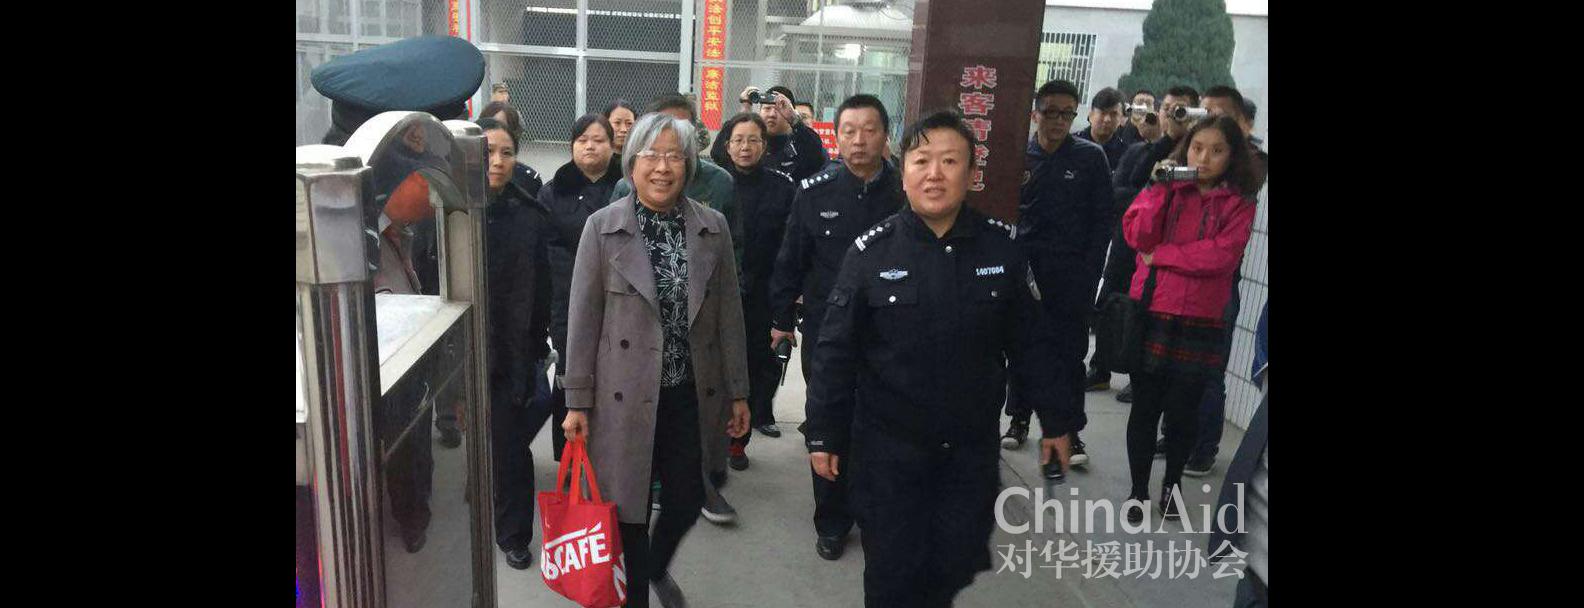 Foto: China Aid